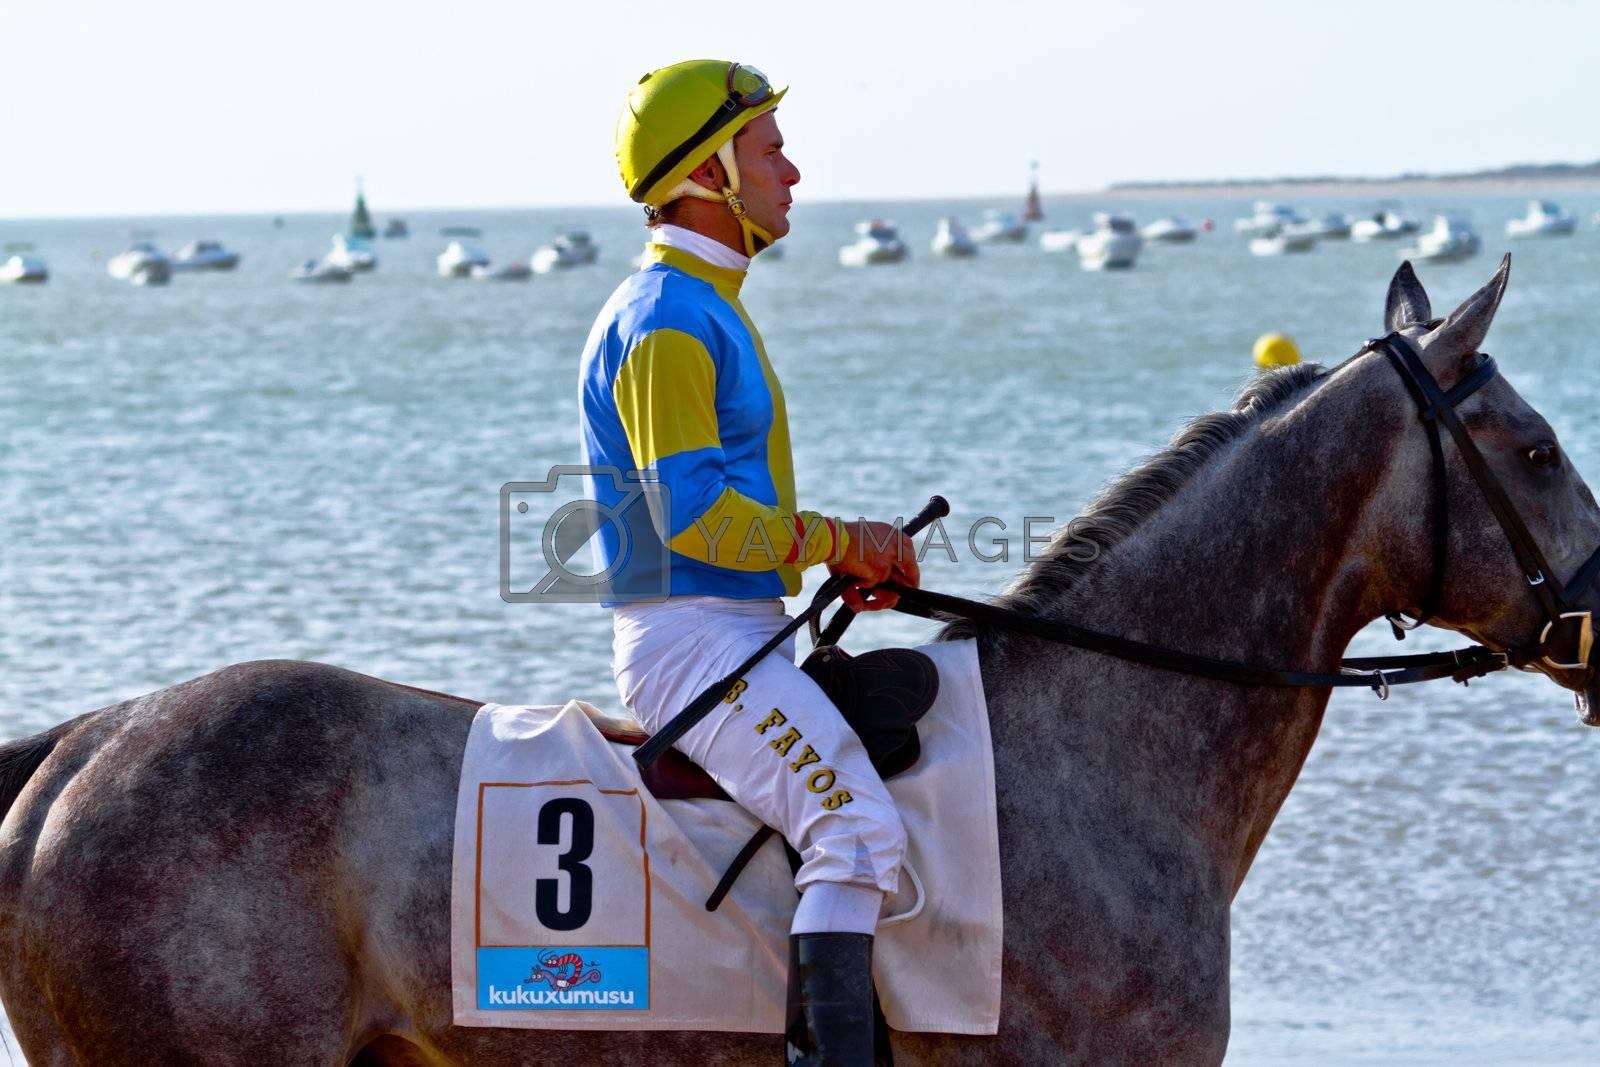 SANLUCAR DE BARRAMEDA, CADIZ, SPAIN - AUGUST 10: Unidentified rider at the start of race horses on Sanlucar de Barrameda beach on August 10, 2011 in Sanlucar de Barrameda, Cadiz, Spain.